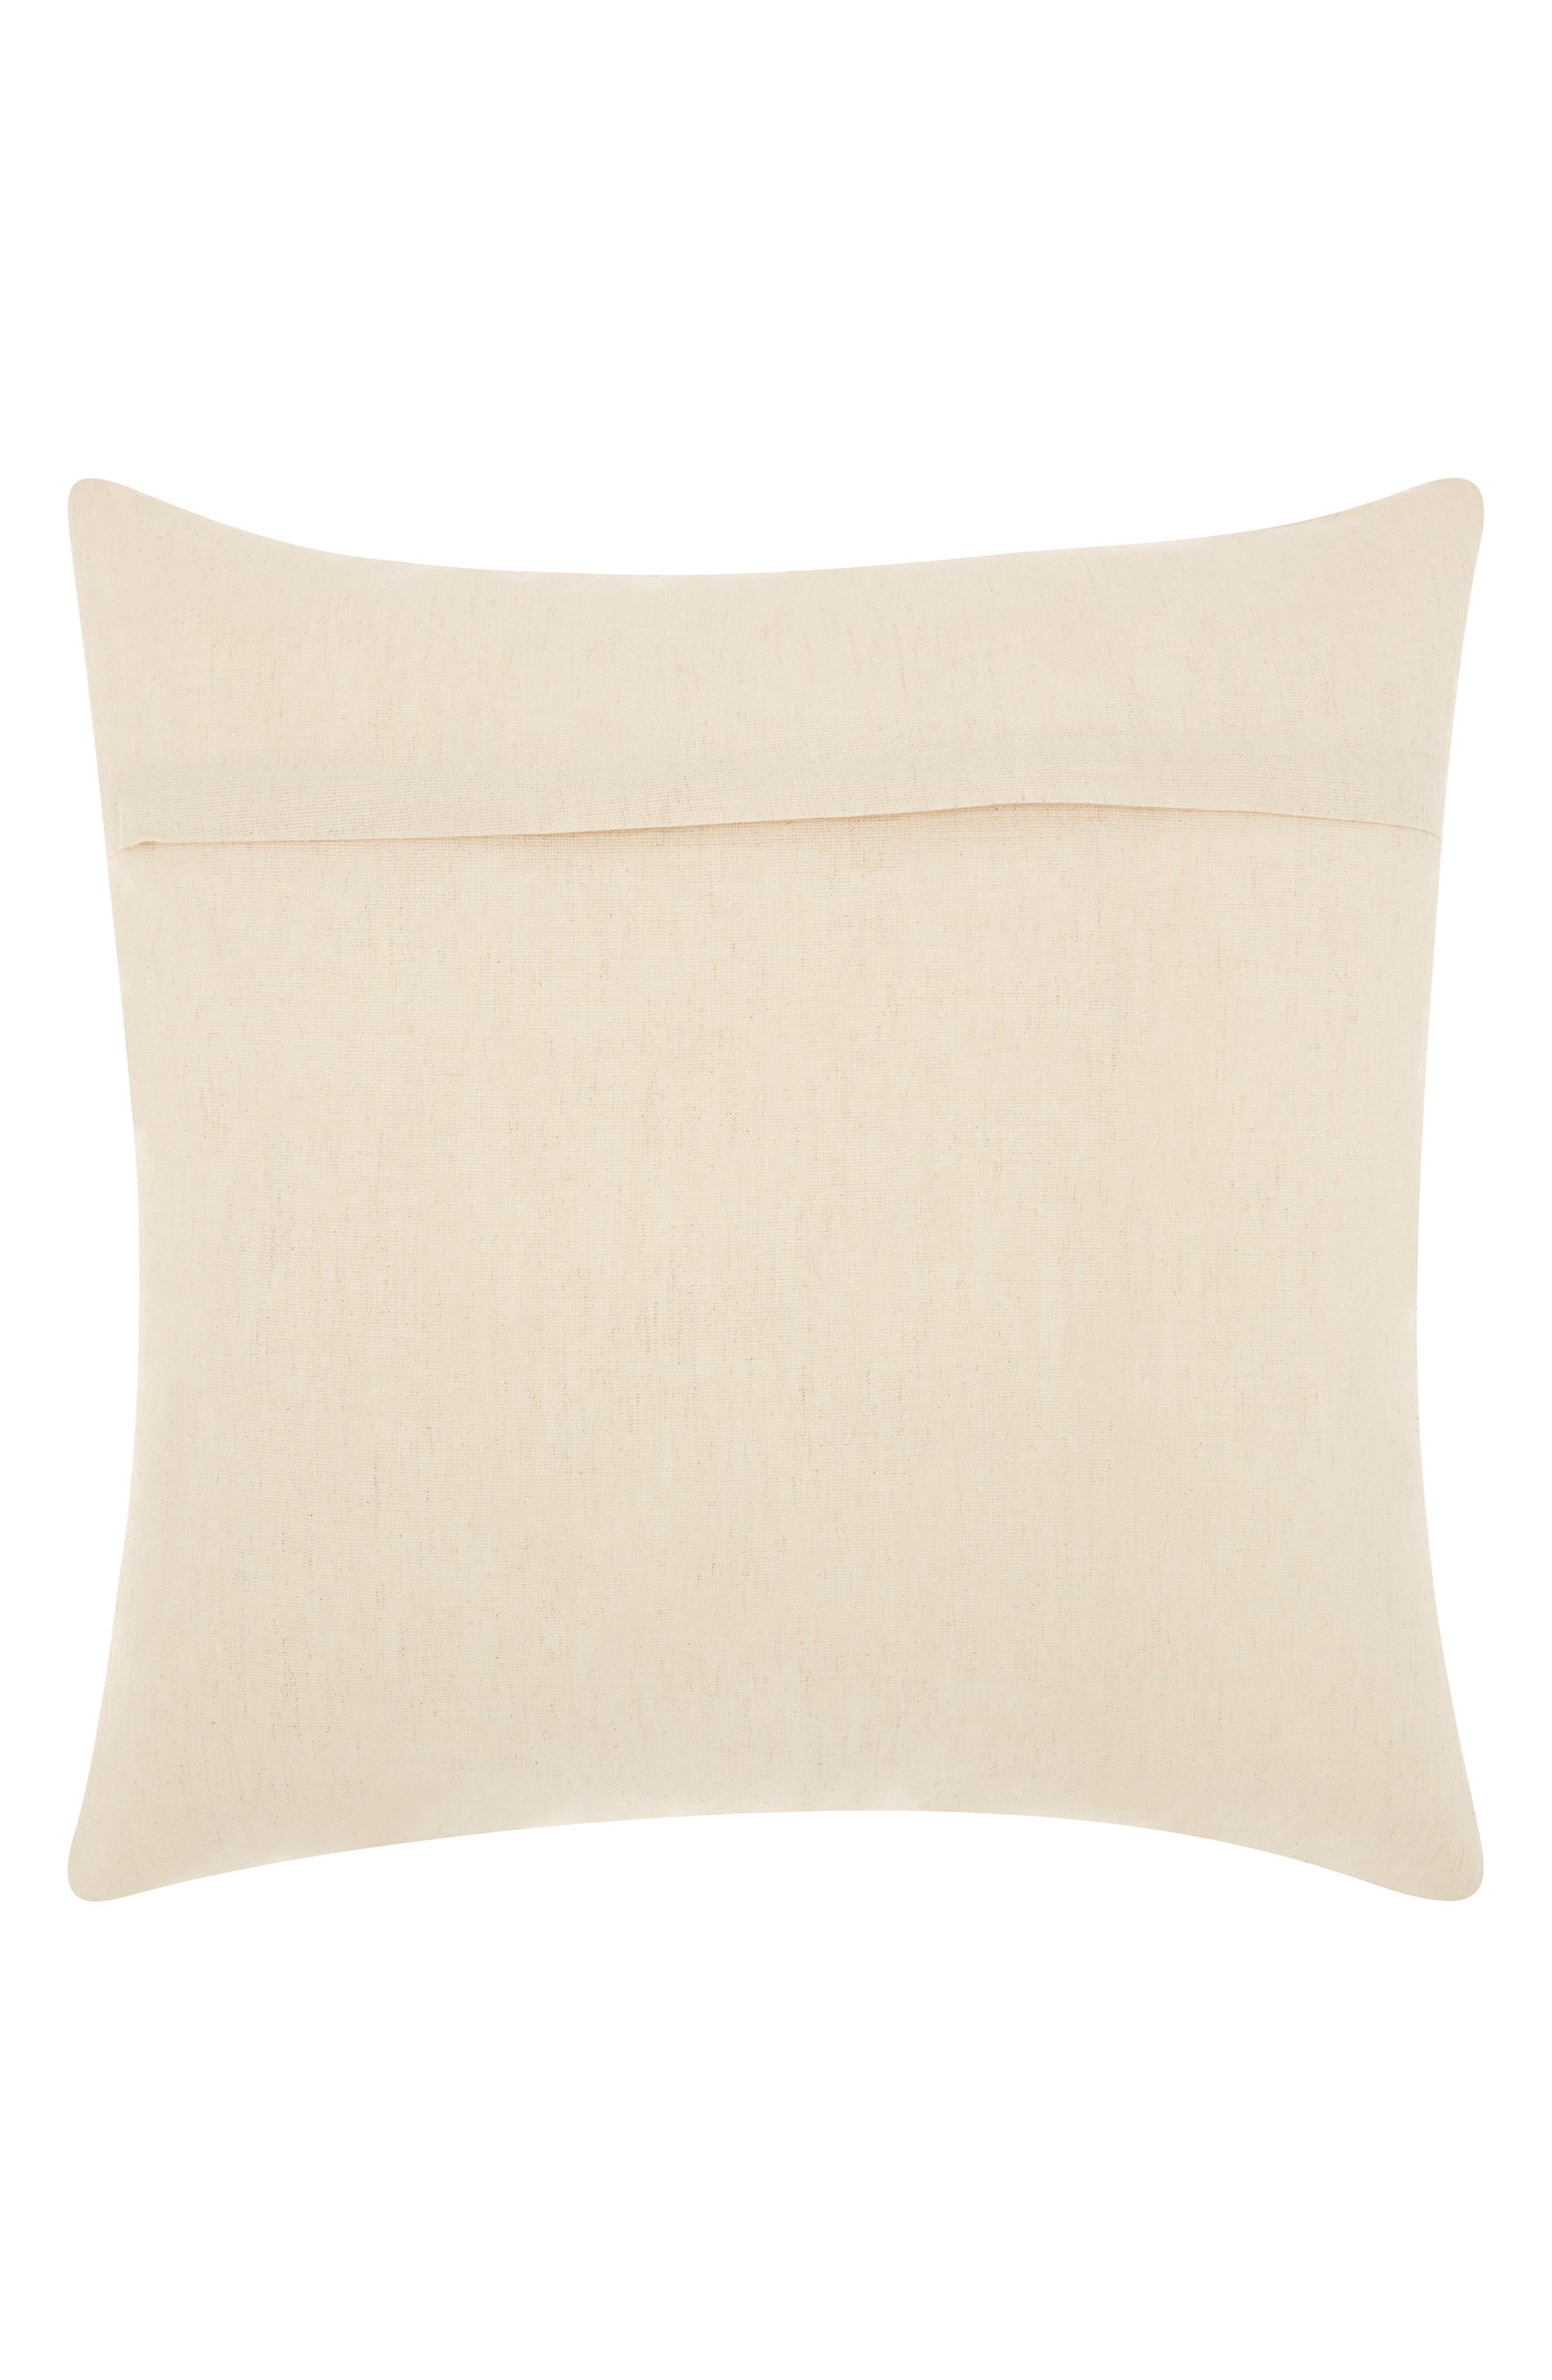 Snow Leopard Scarf Accent Pillow,                             Alternate thumbnail 2, color,